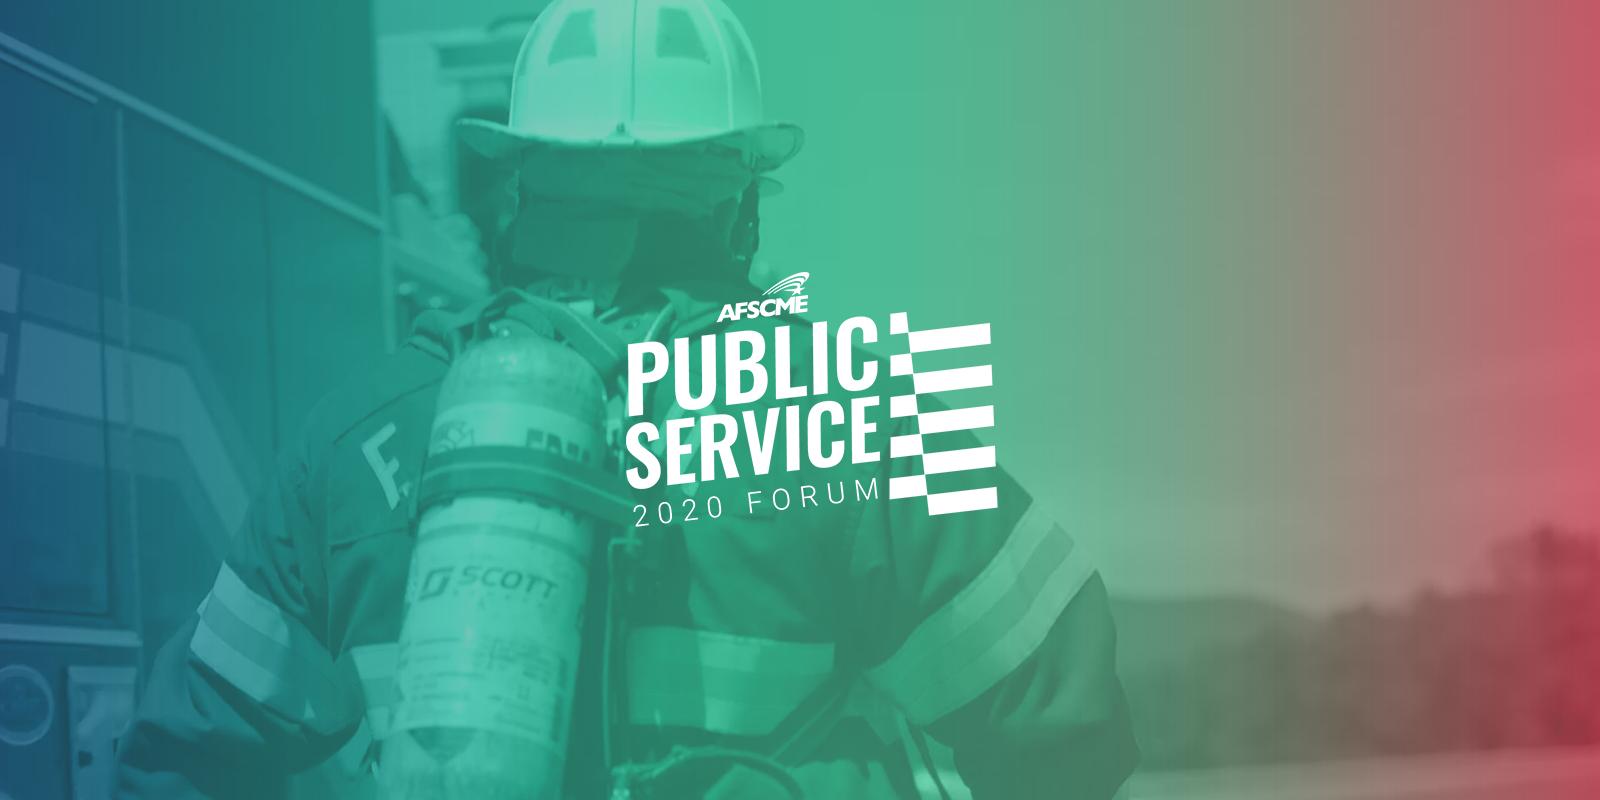 Public Service 2020 Forum over photo of a public service worker